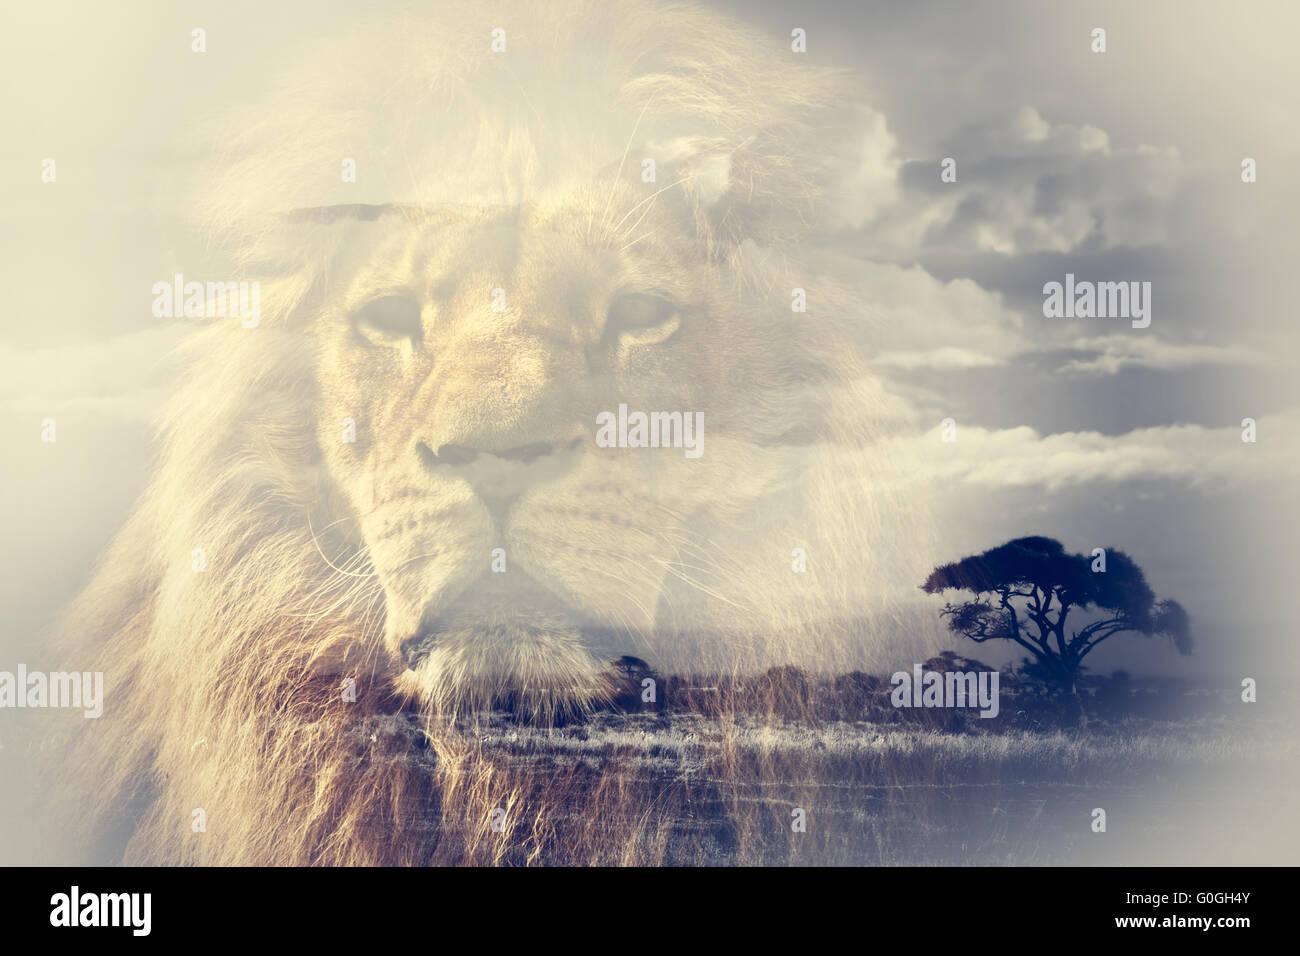 Double exposure of lion and Mount Kilimanjaro savanna landscape. - Stock Image